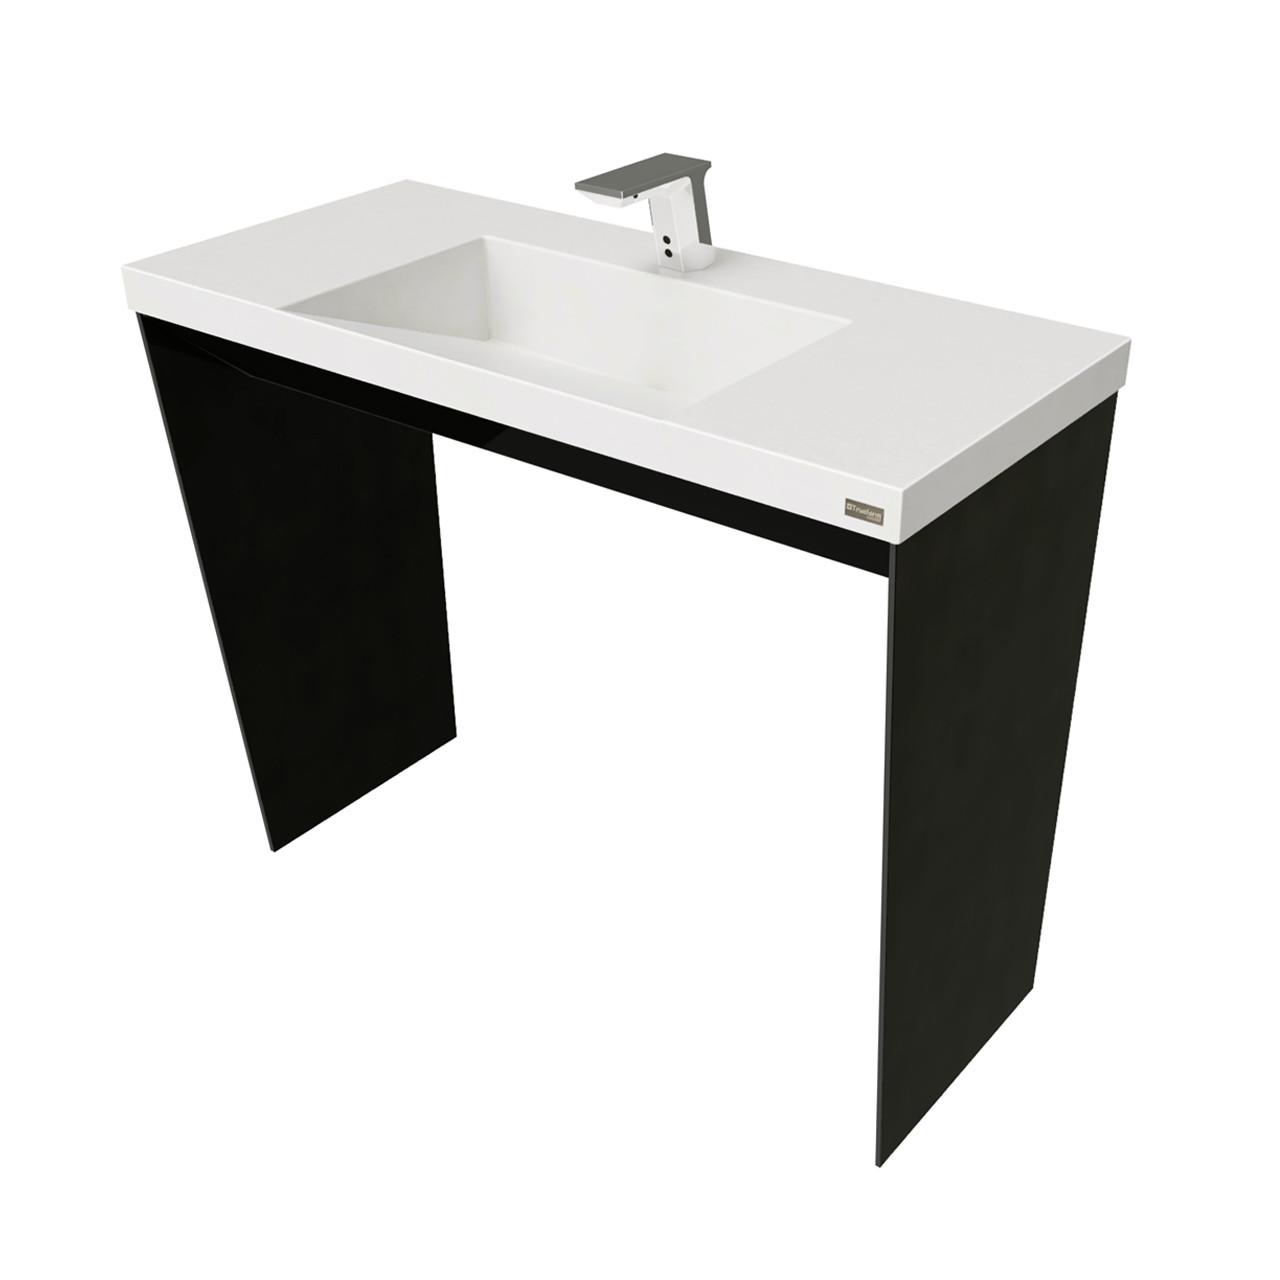 40 contempo vanity with concrete ramp sink